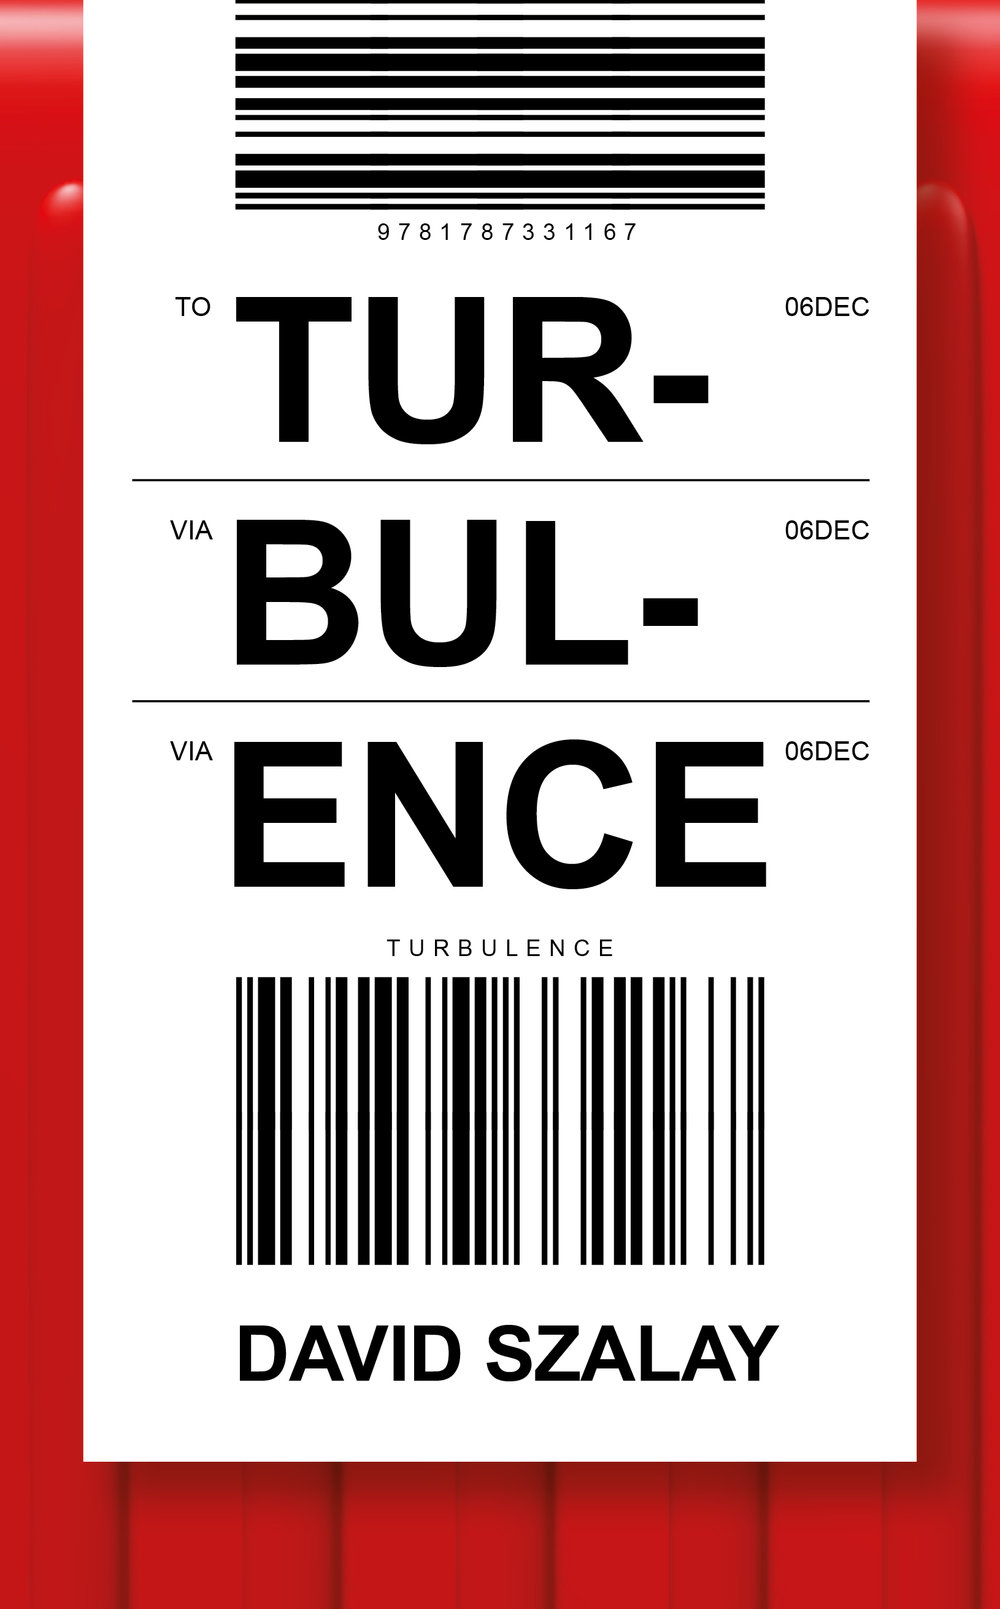 Turbulence Jpeg 1[4].jpg